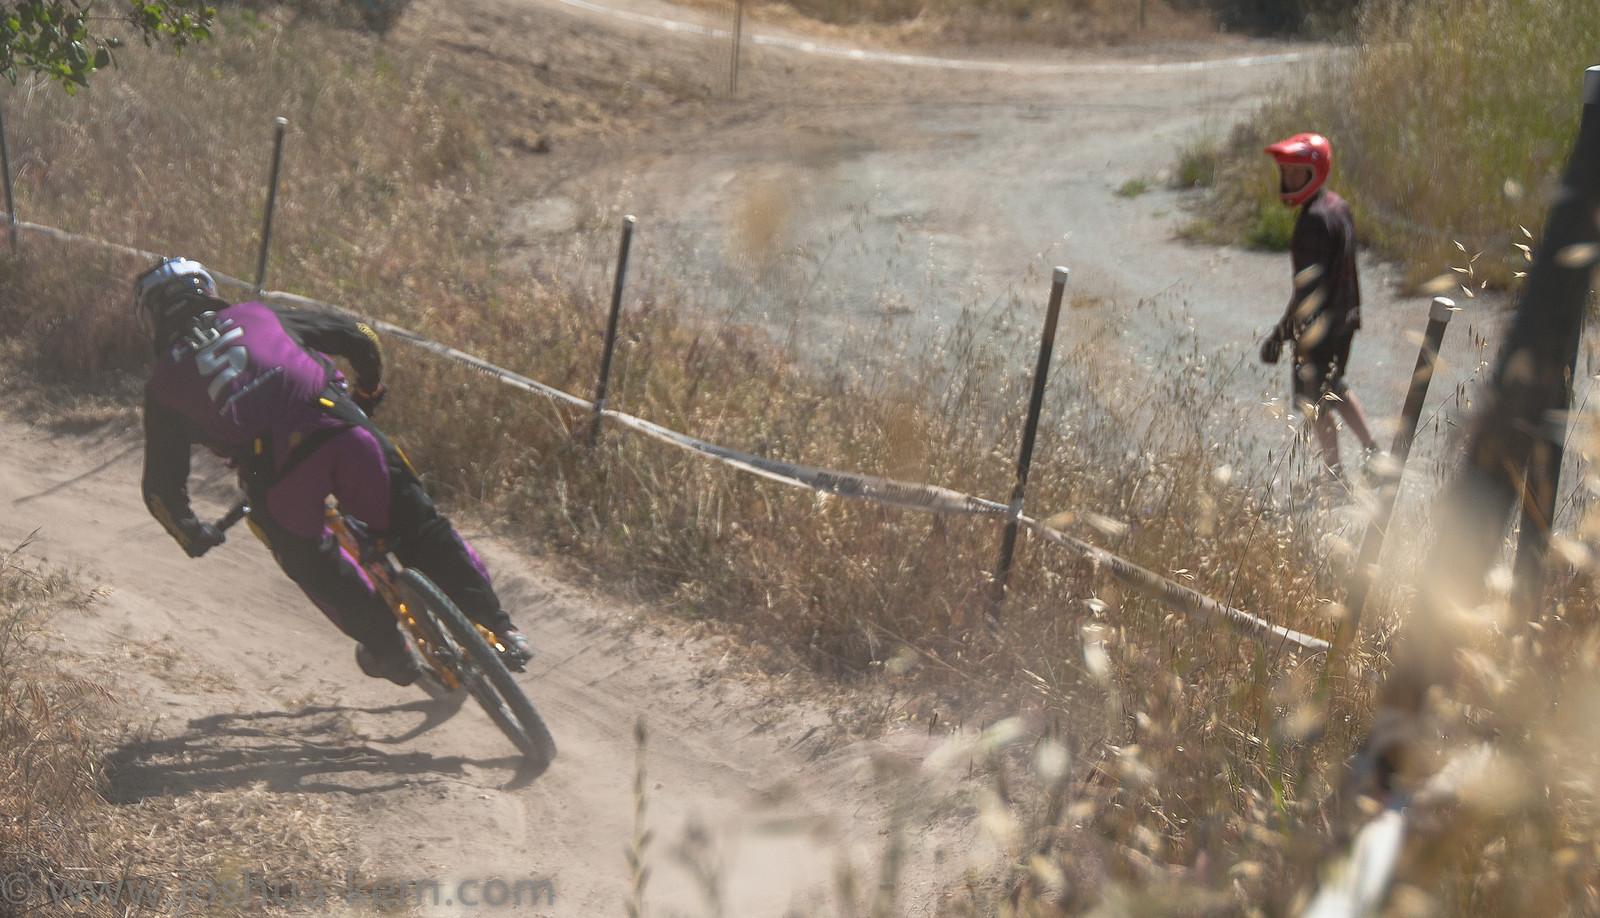 4-19-13DHPractice (24 of 36) - jkern620 - Mountain Biking Pictures - Vital MTB